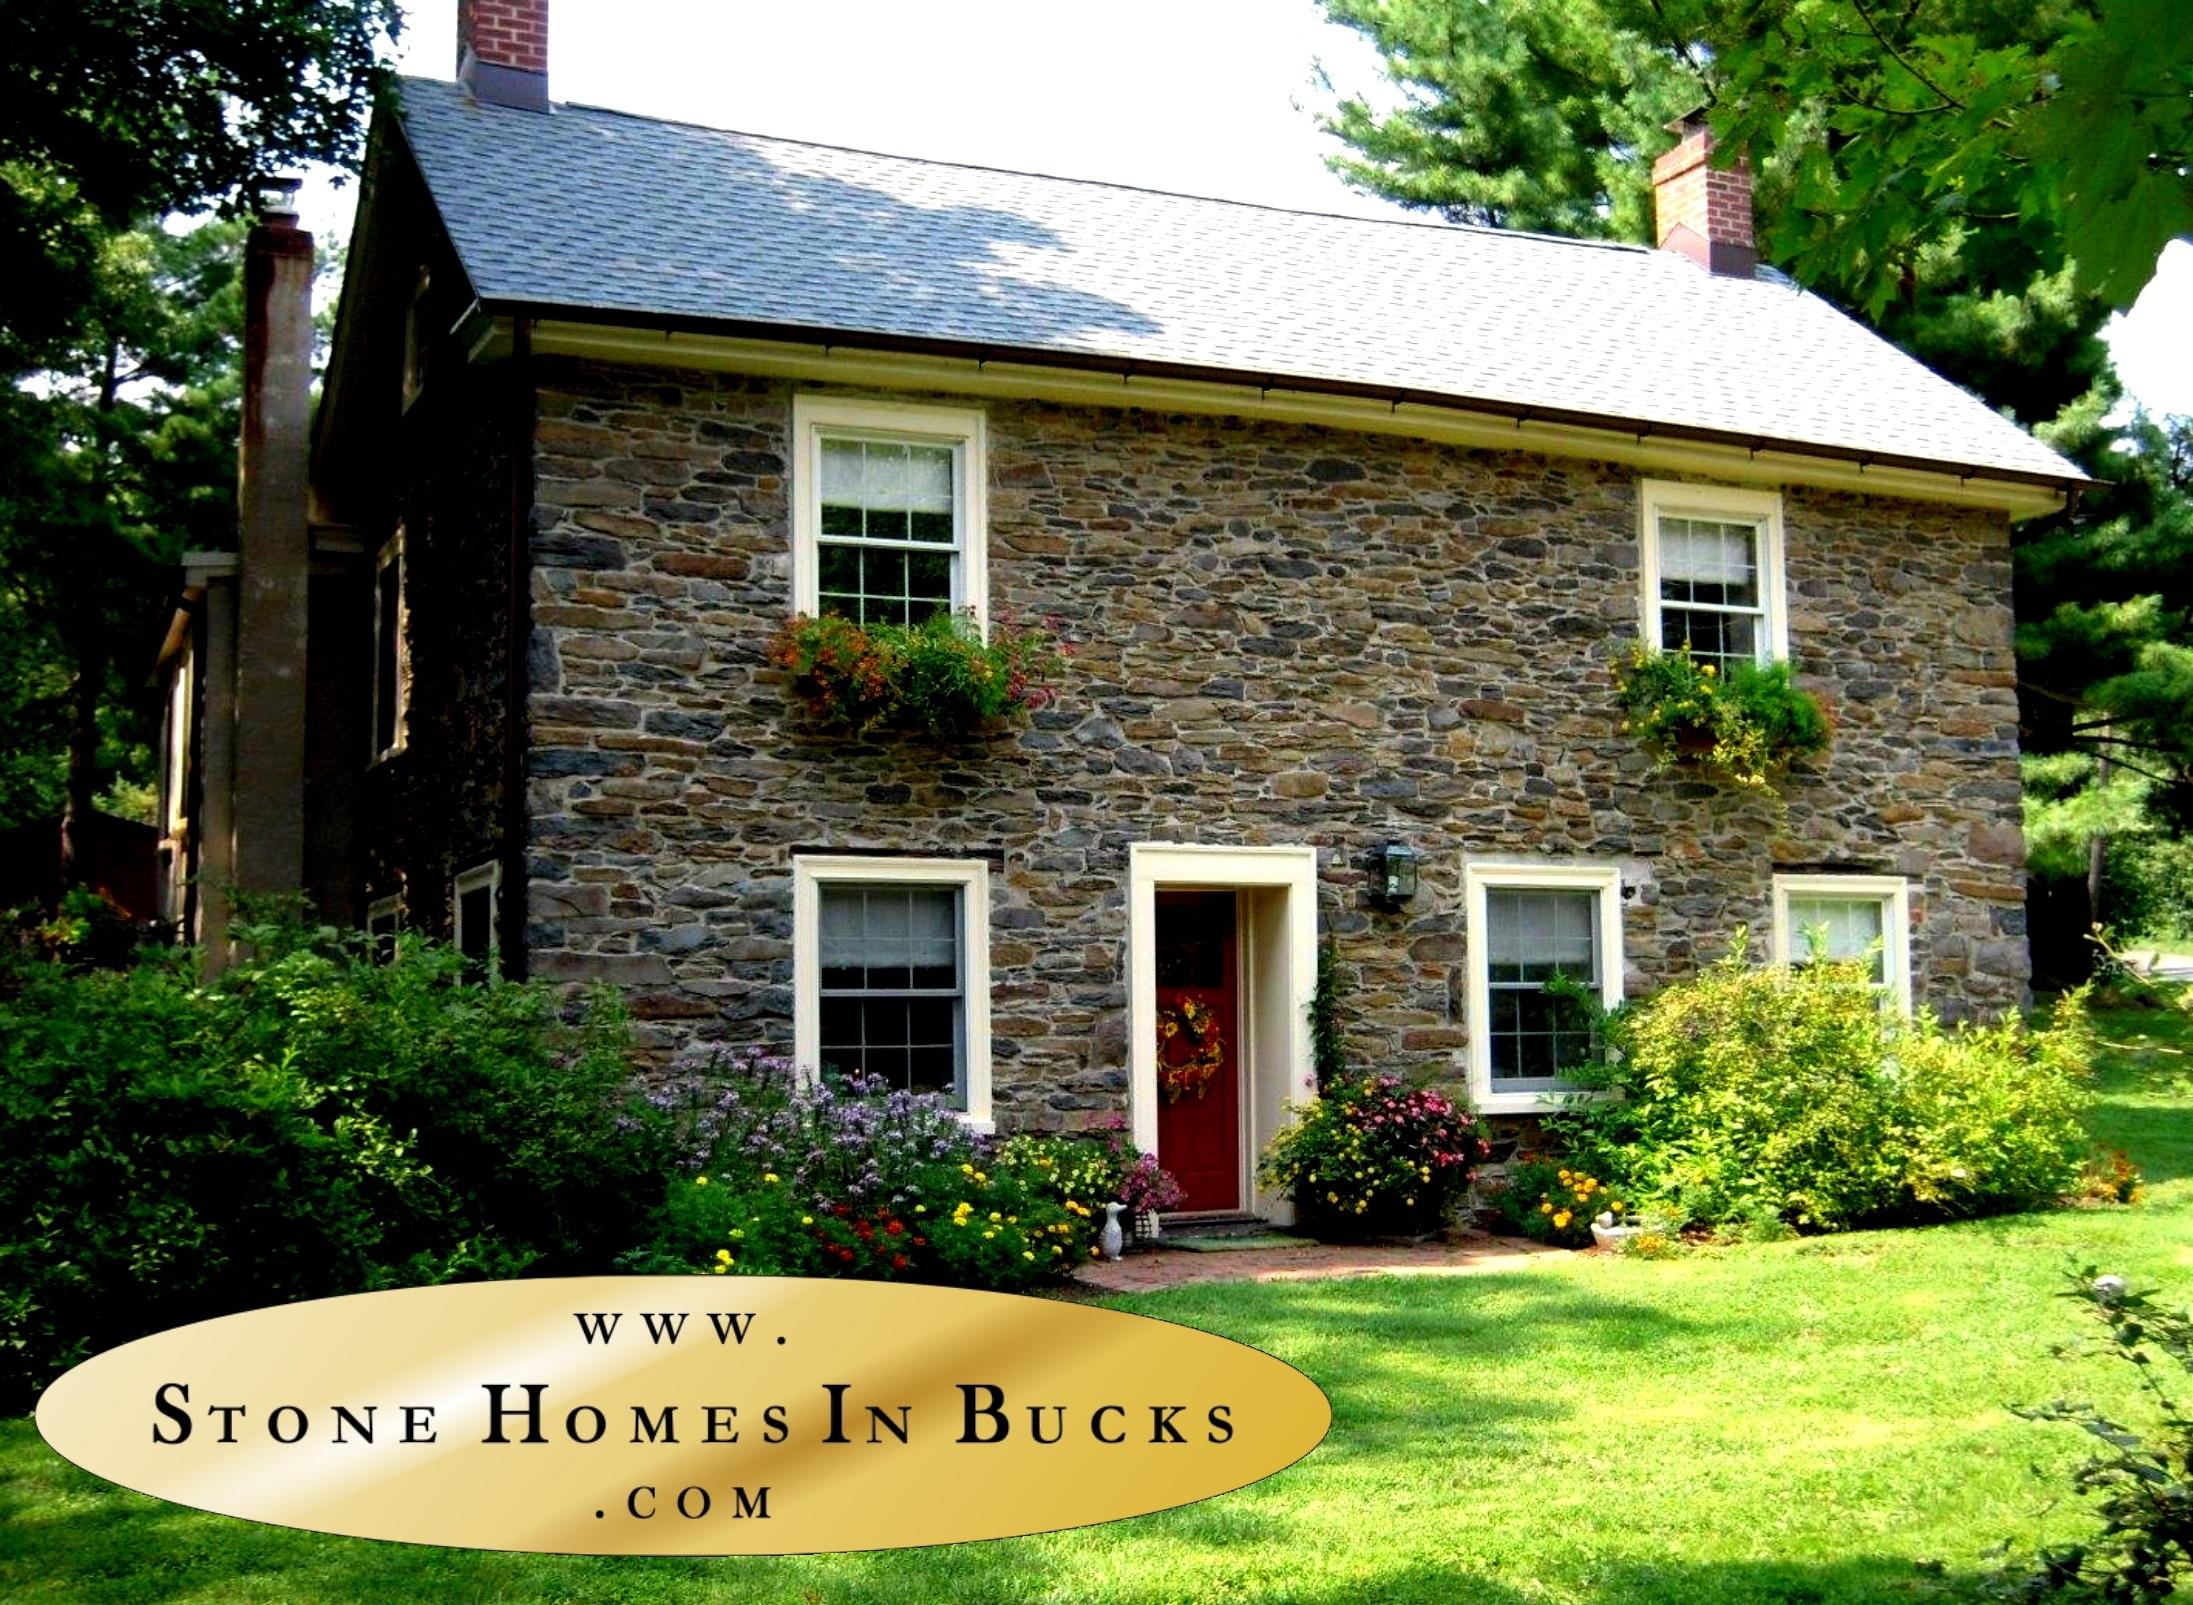 Stone Homes In Bucks | Honeysuckle Cottage | Doylestown Realtor | Doylestown Realtors